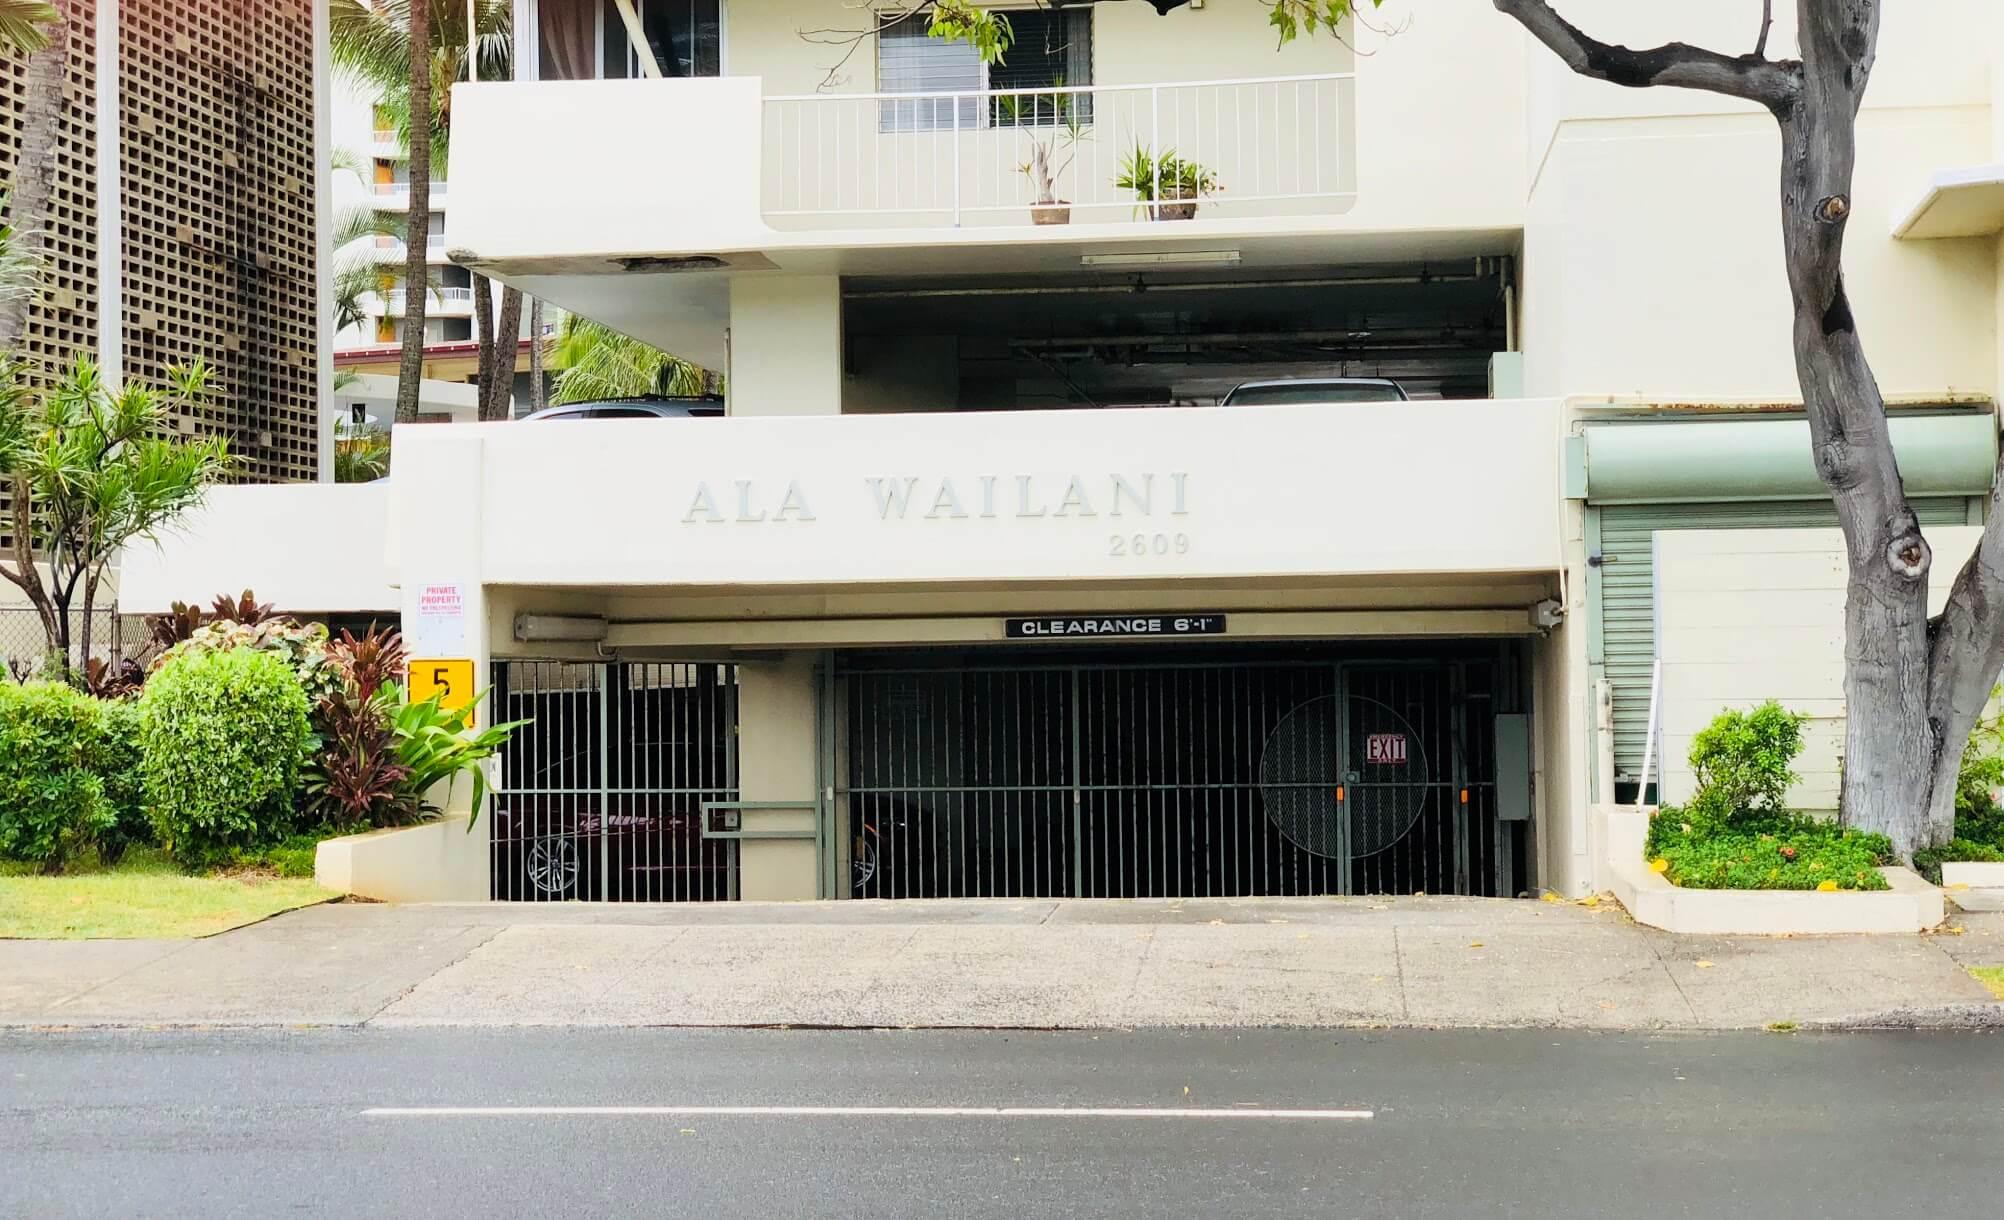 Ala Wailaniの駐車場